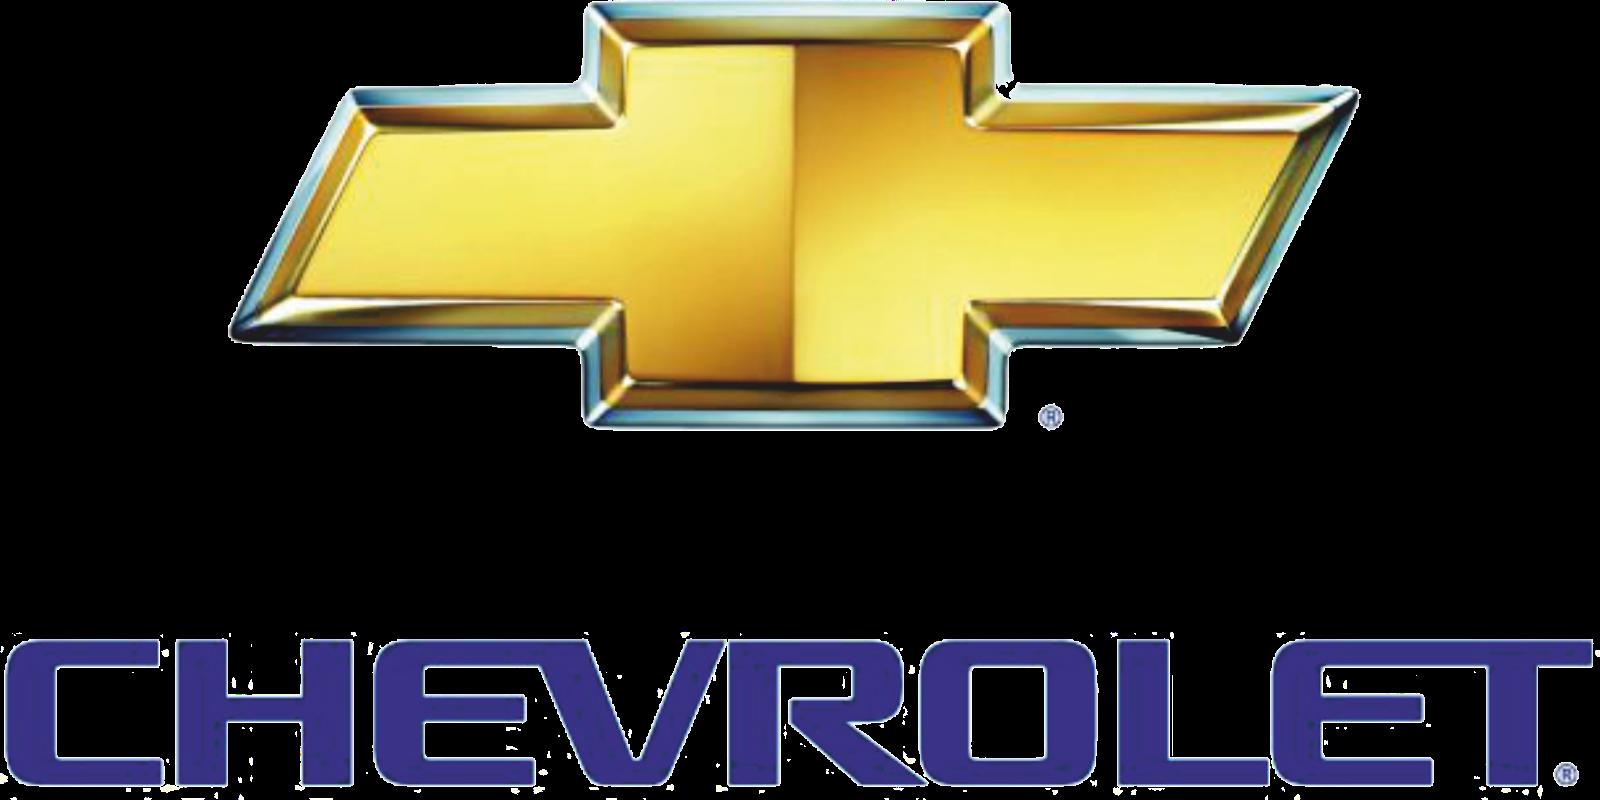 Chevrolet Logo Vector 2015 Wallpaper HD - Chevrolet HD PNG